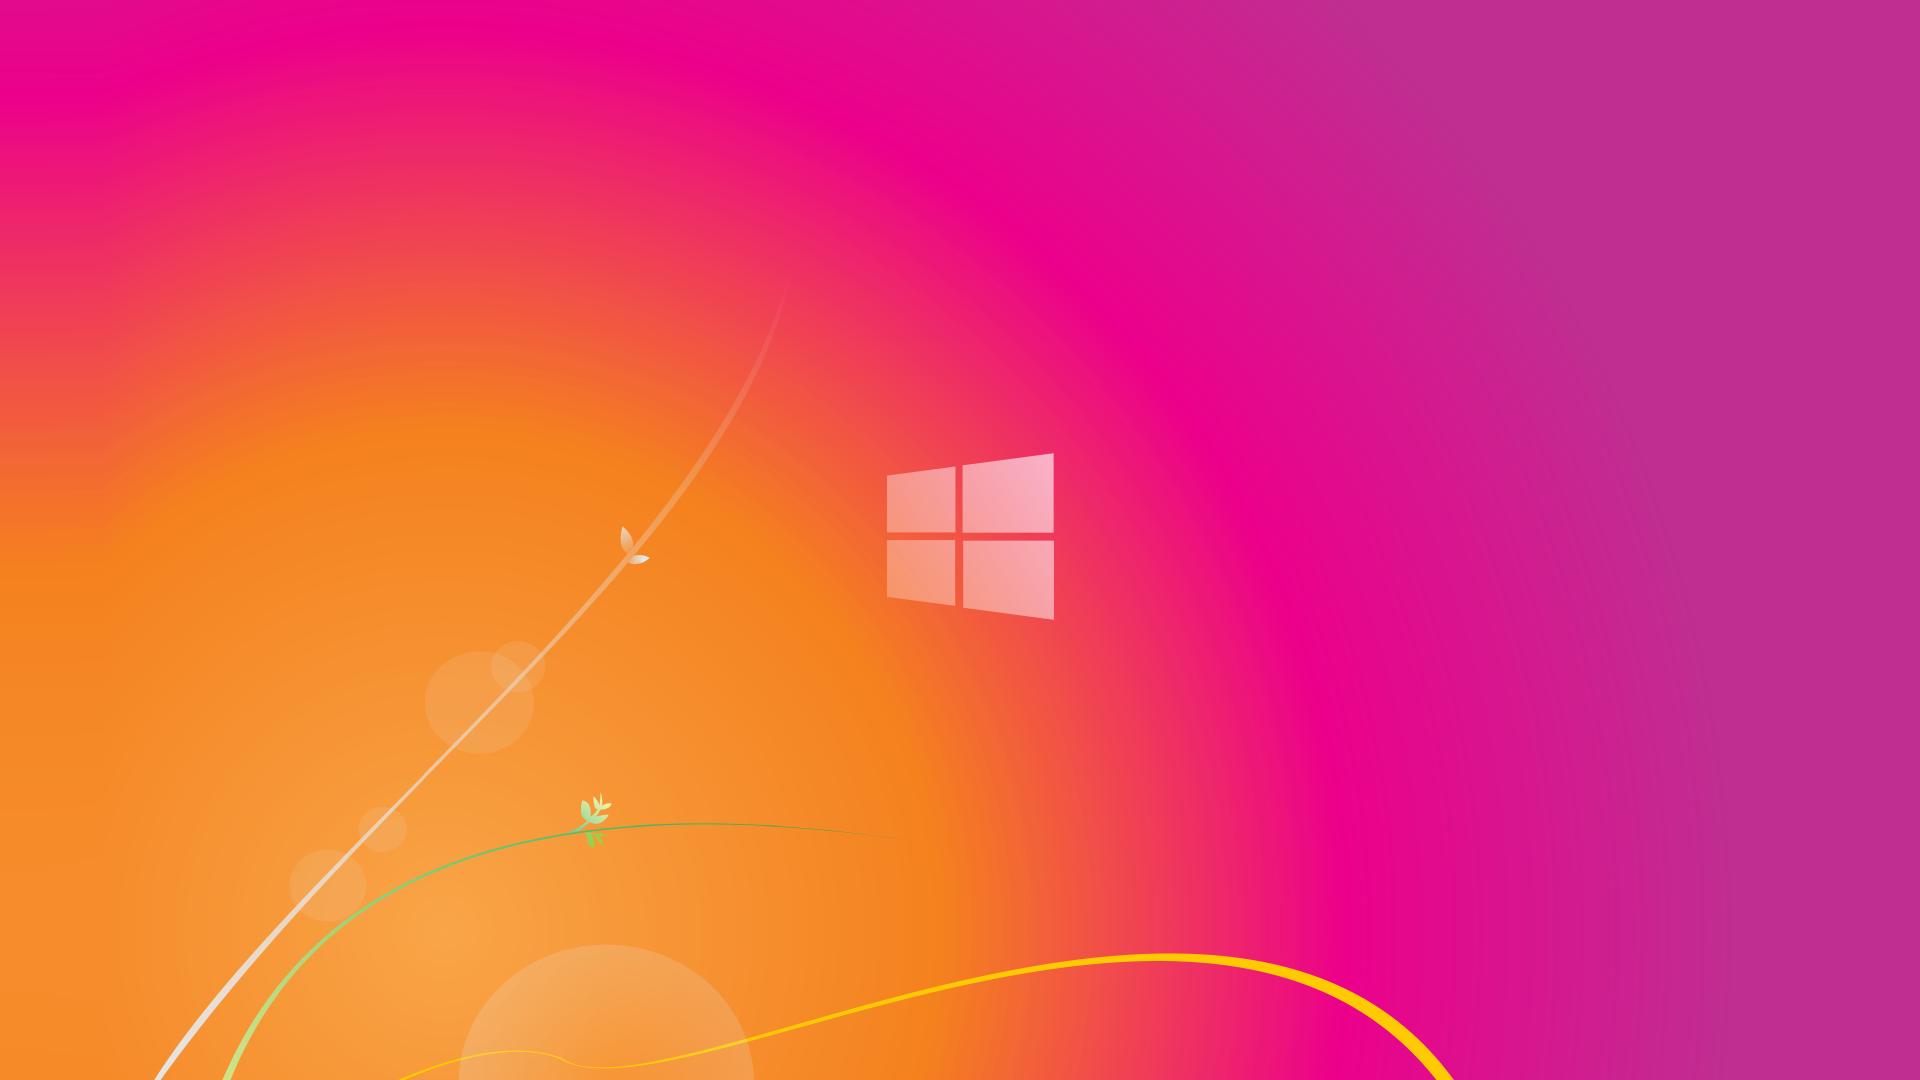 Pink Windows 81 Wallpaper 1920x1080